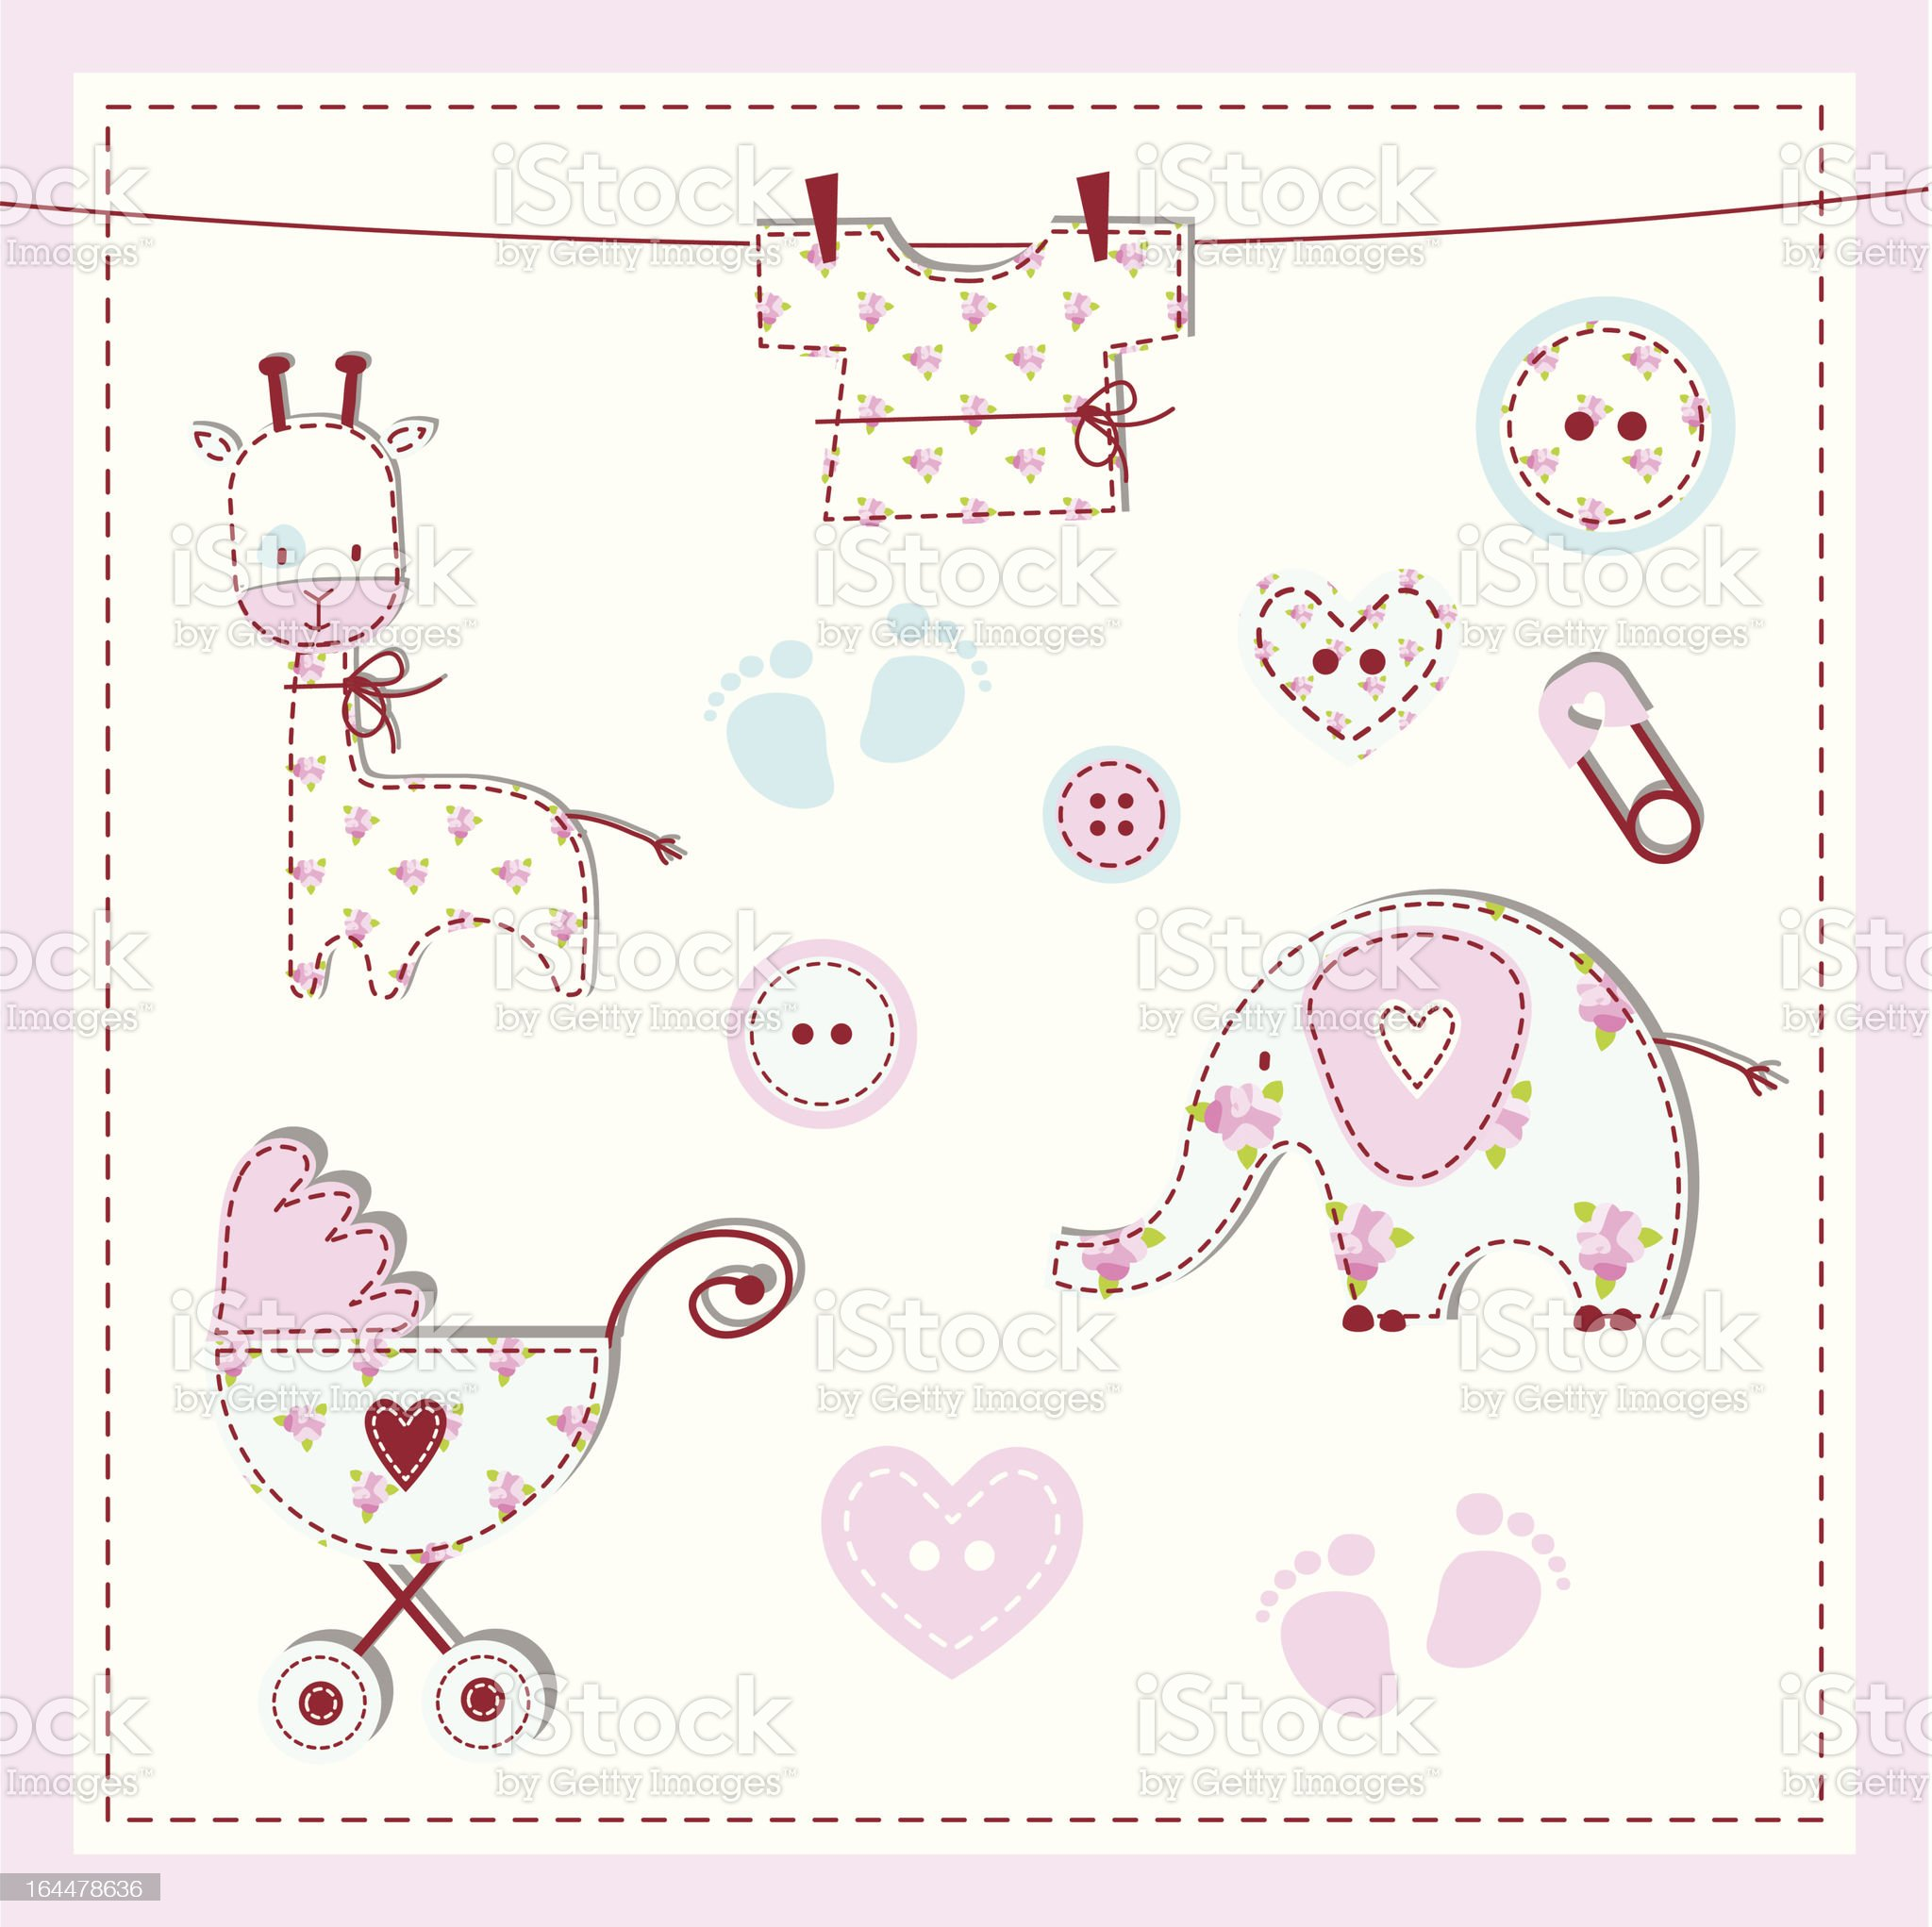 Baby shower design elements royalty-free stock vector art